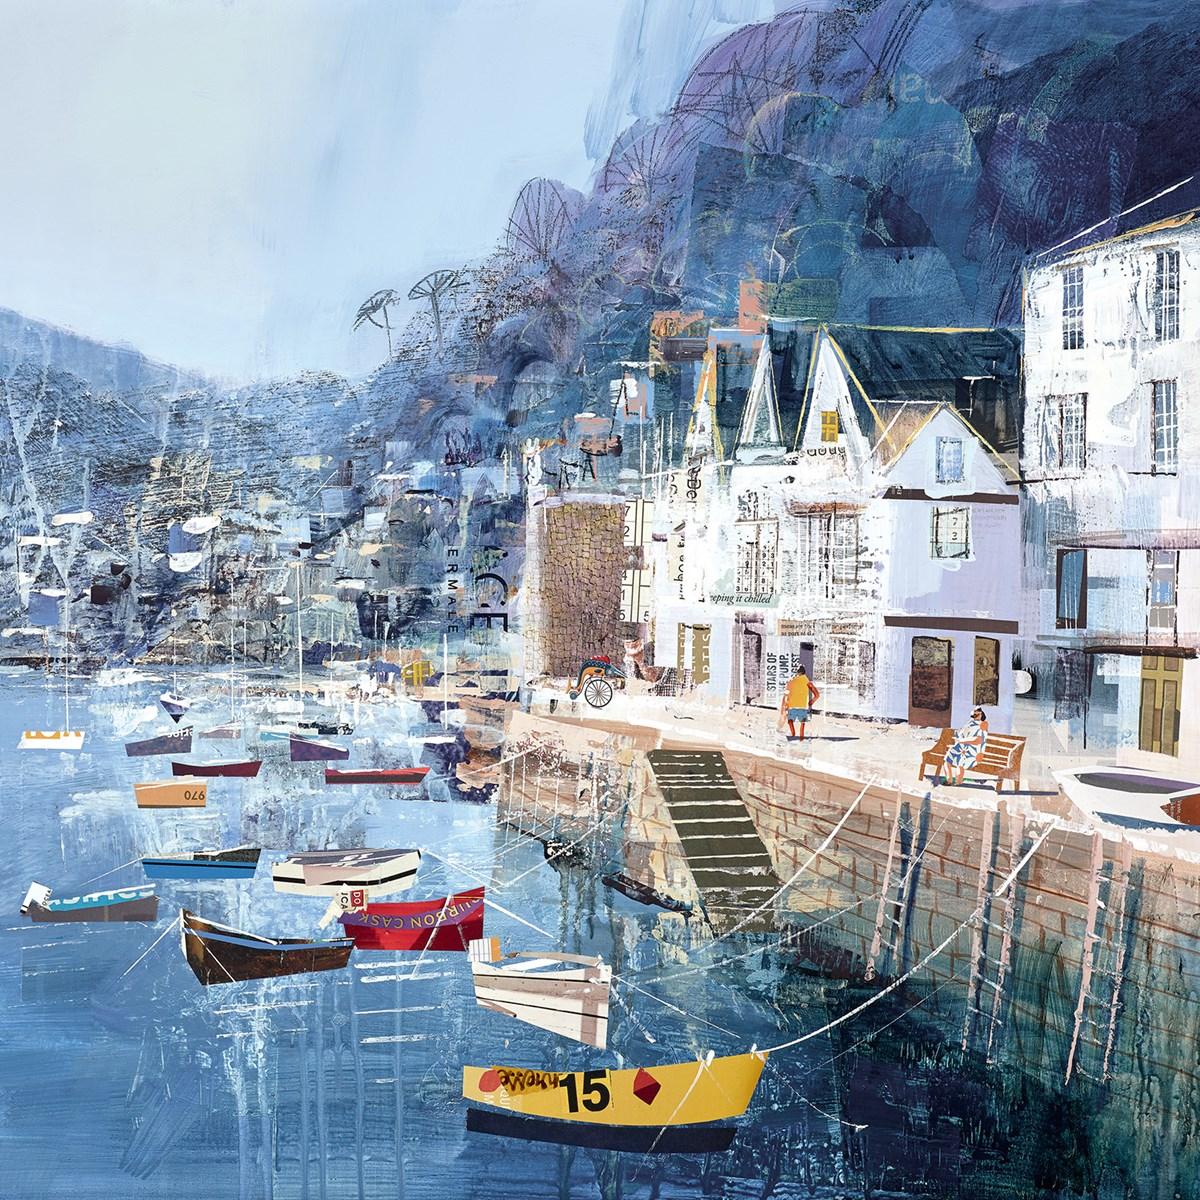 https://I1158201550.artbookresources.co.uk/Products/LBTL055/Image